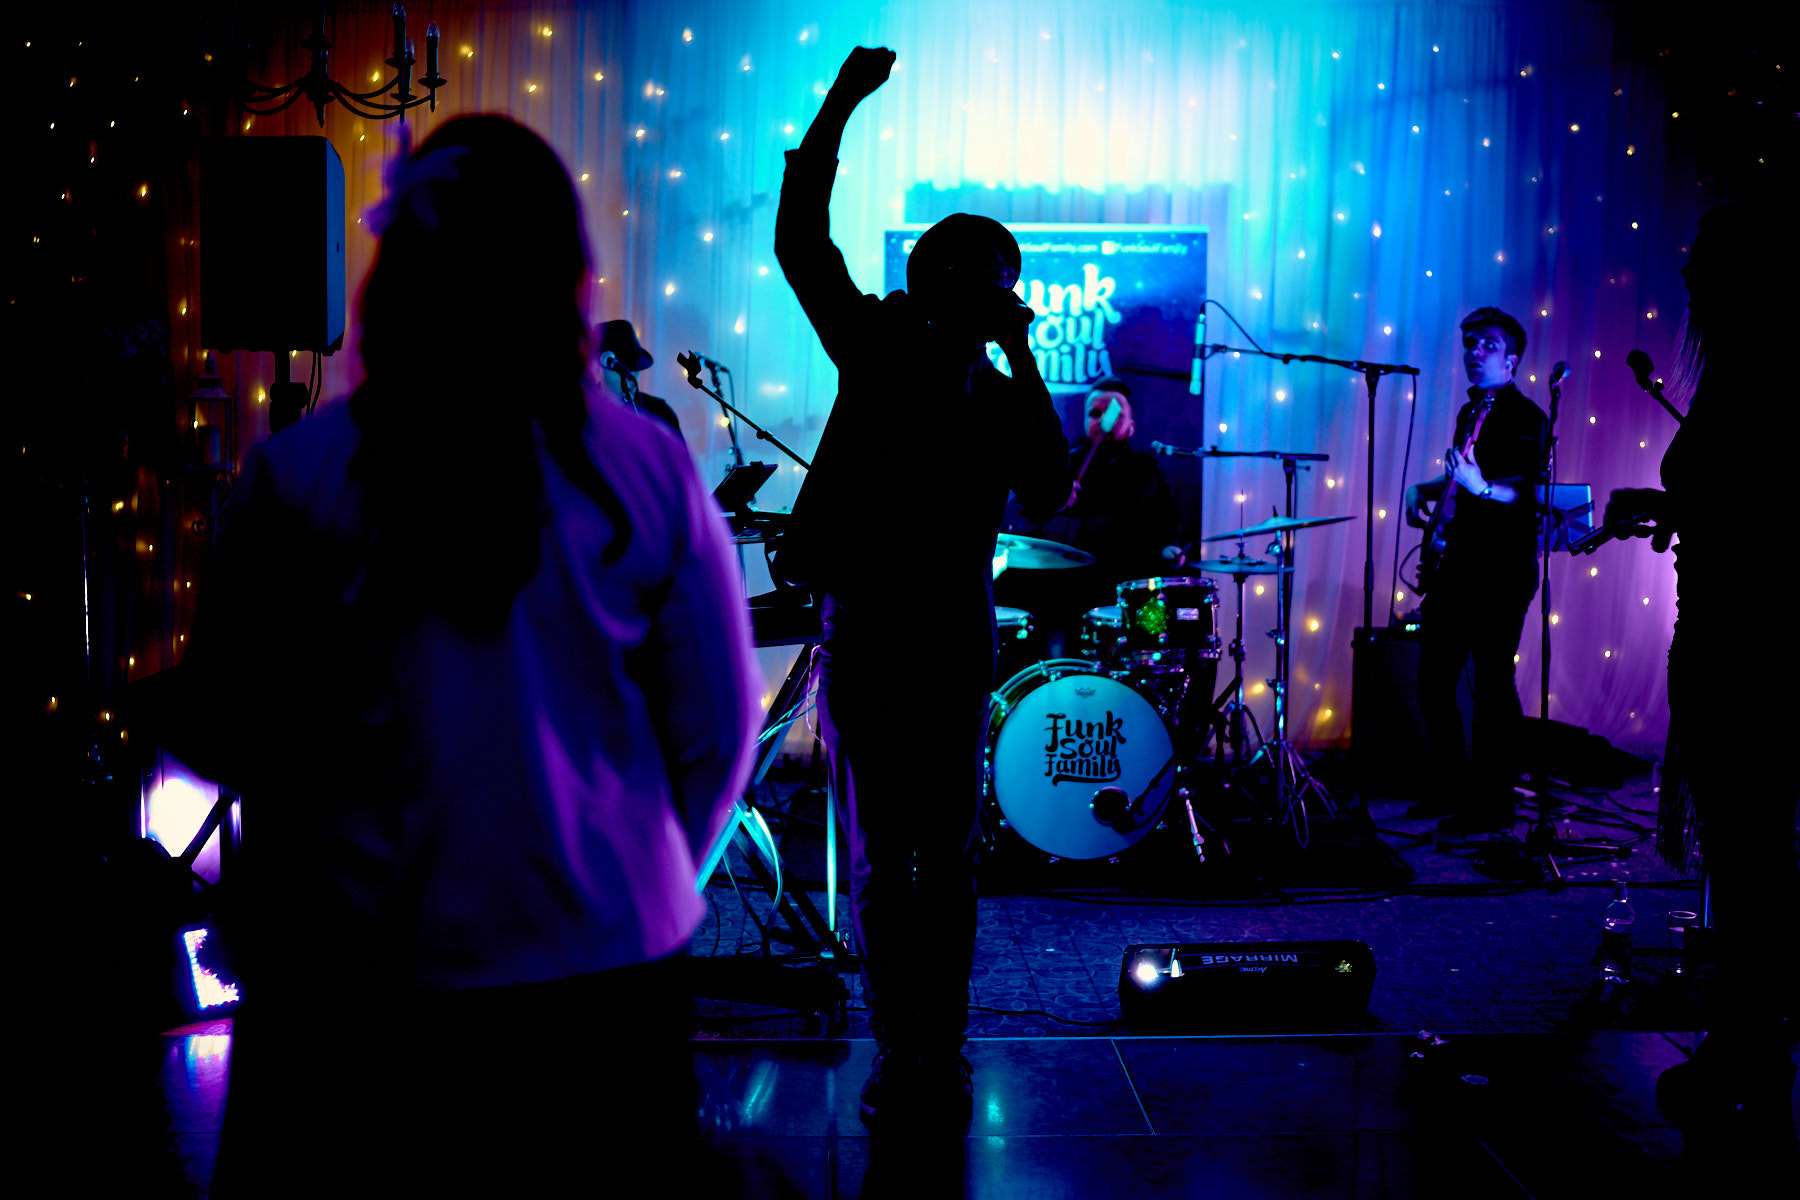 Funk Soul Family Performing at Lancashire Wedding